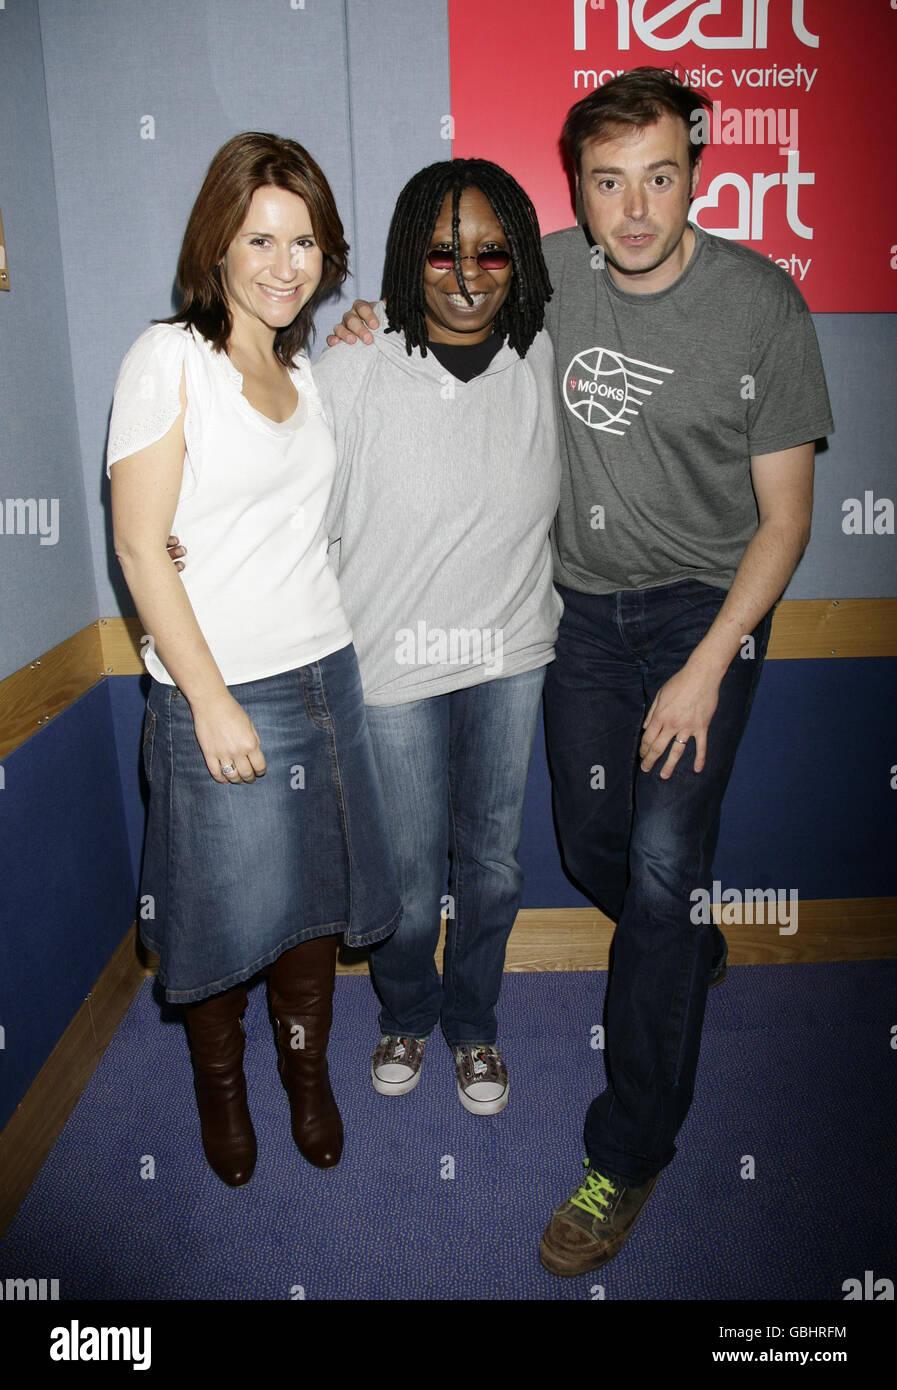 Whoopi Goldberg visits Heart FM - Stock Image